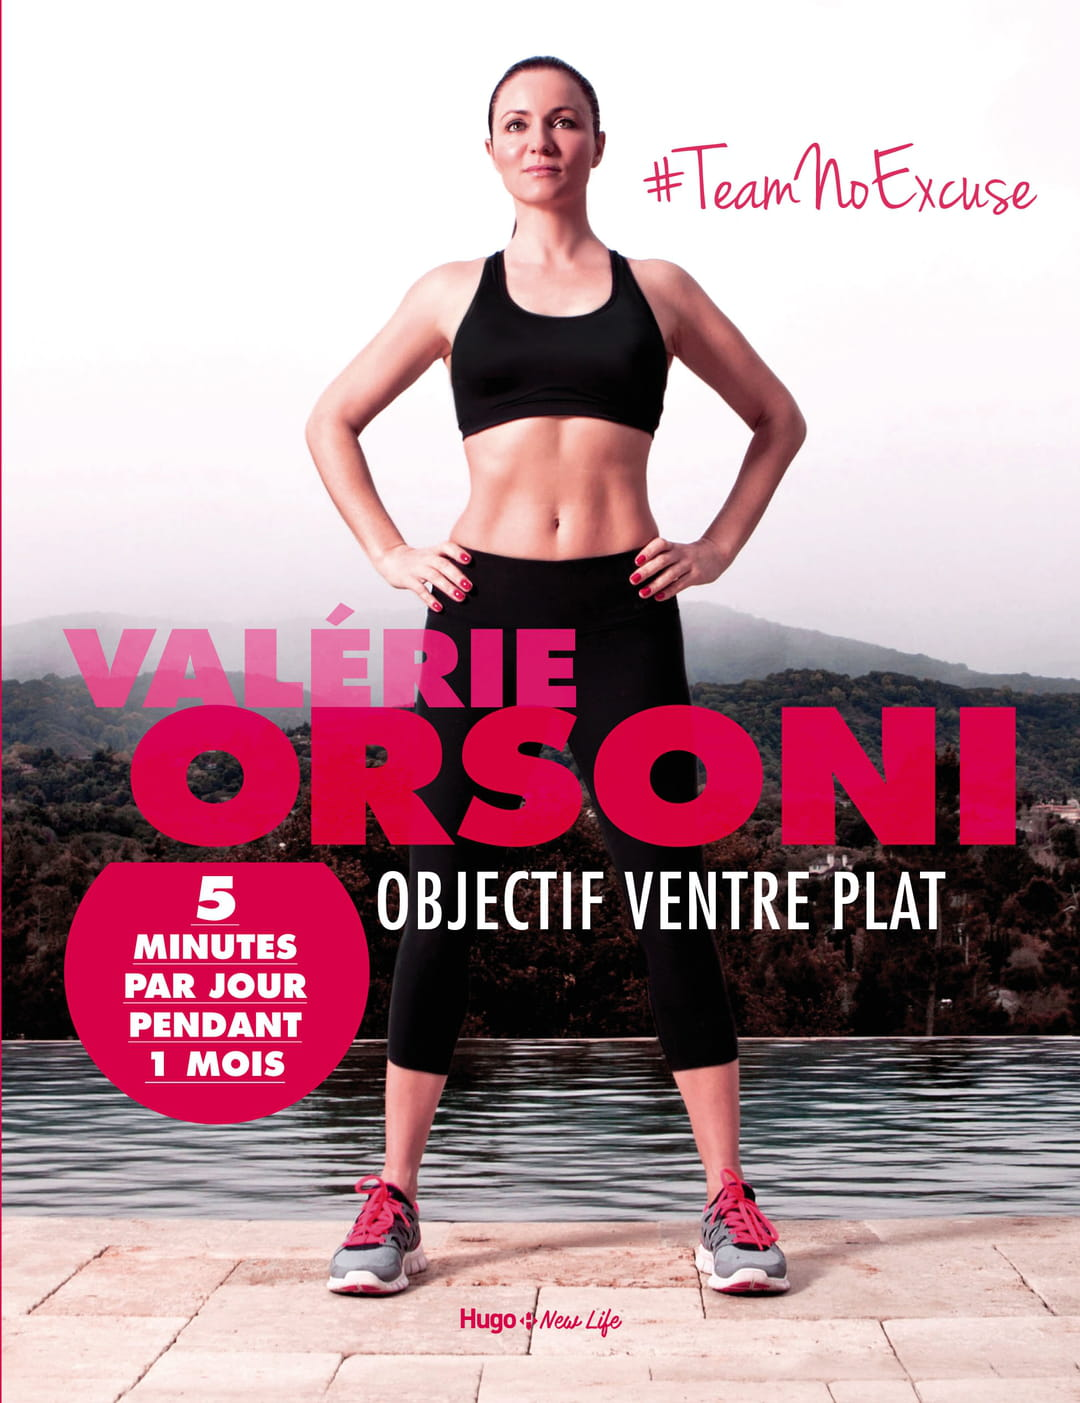 valerie-orsoni-ventre-plat-5-minutes